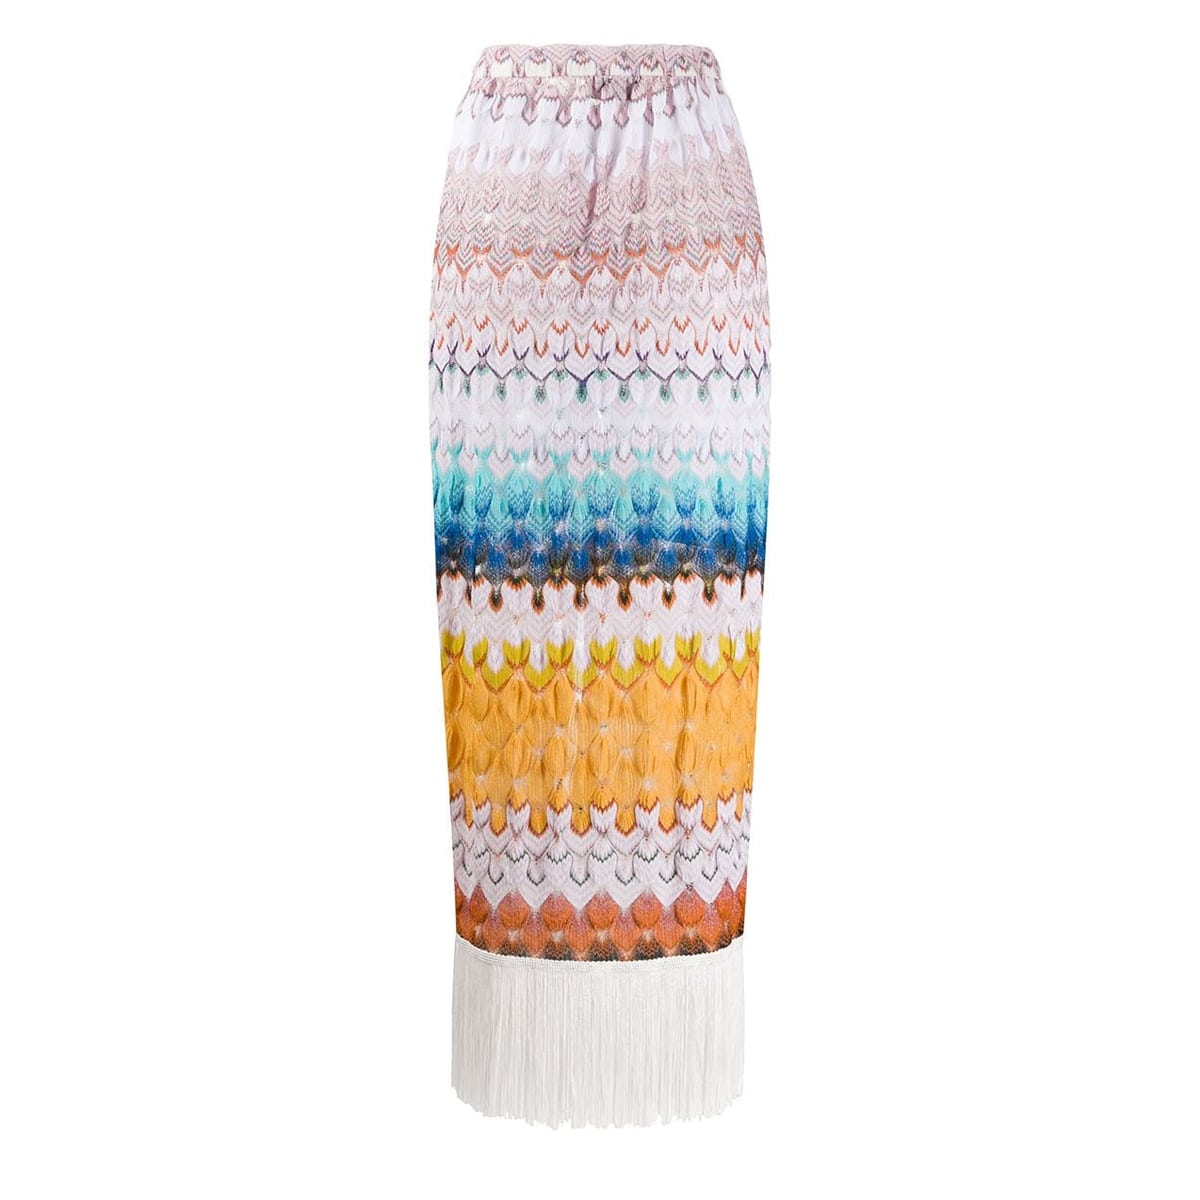 Abstract print knitted sarong skirt